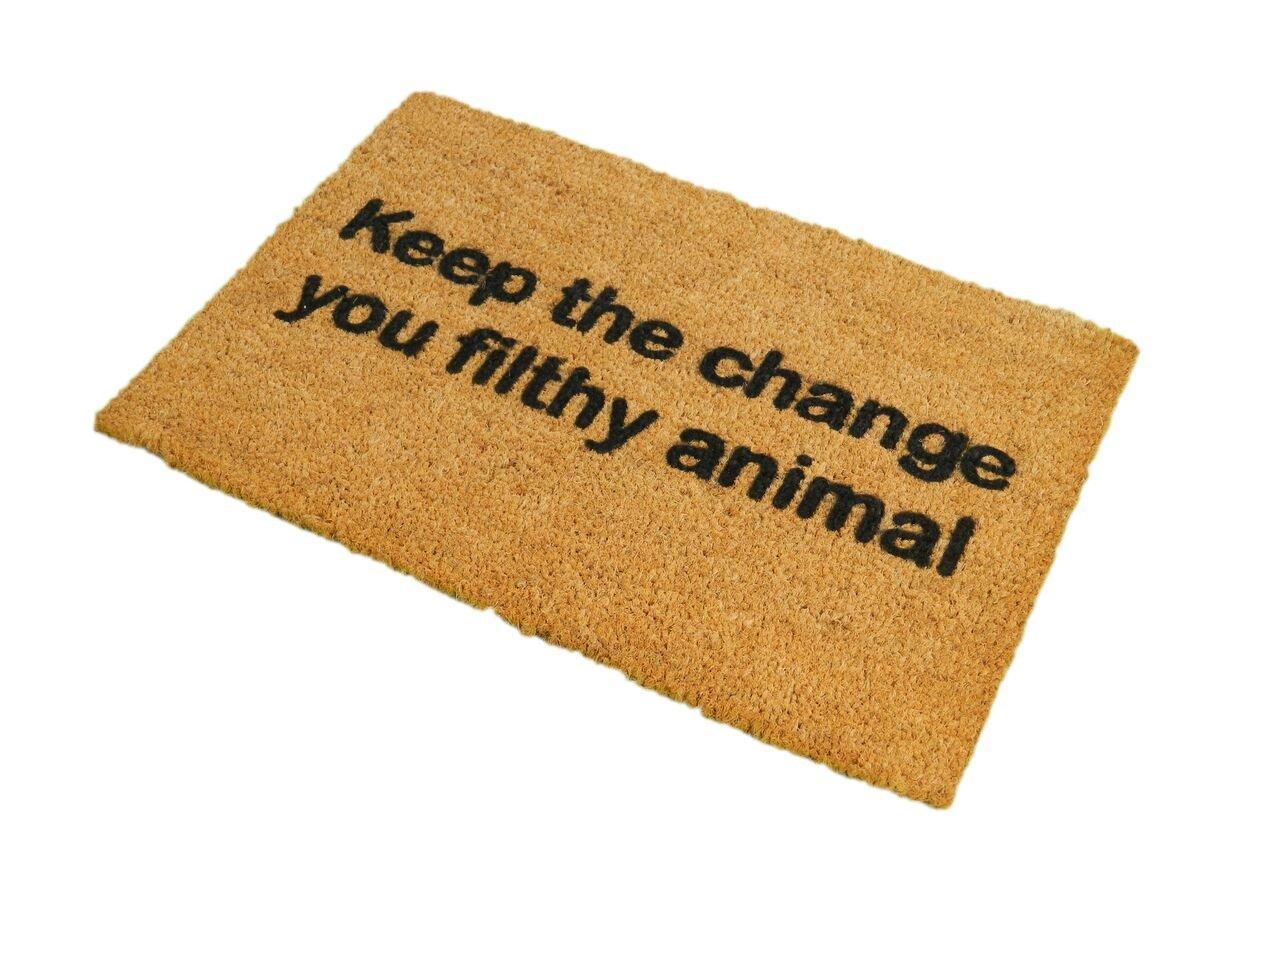 Doormat keep the change you filthy animal doormat photographs : Keep The Change You Filthy Animal Doormat: Amazon.co.uk: Kitchen ...